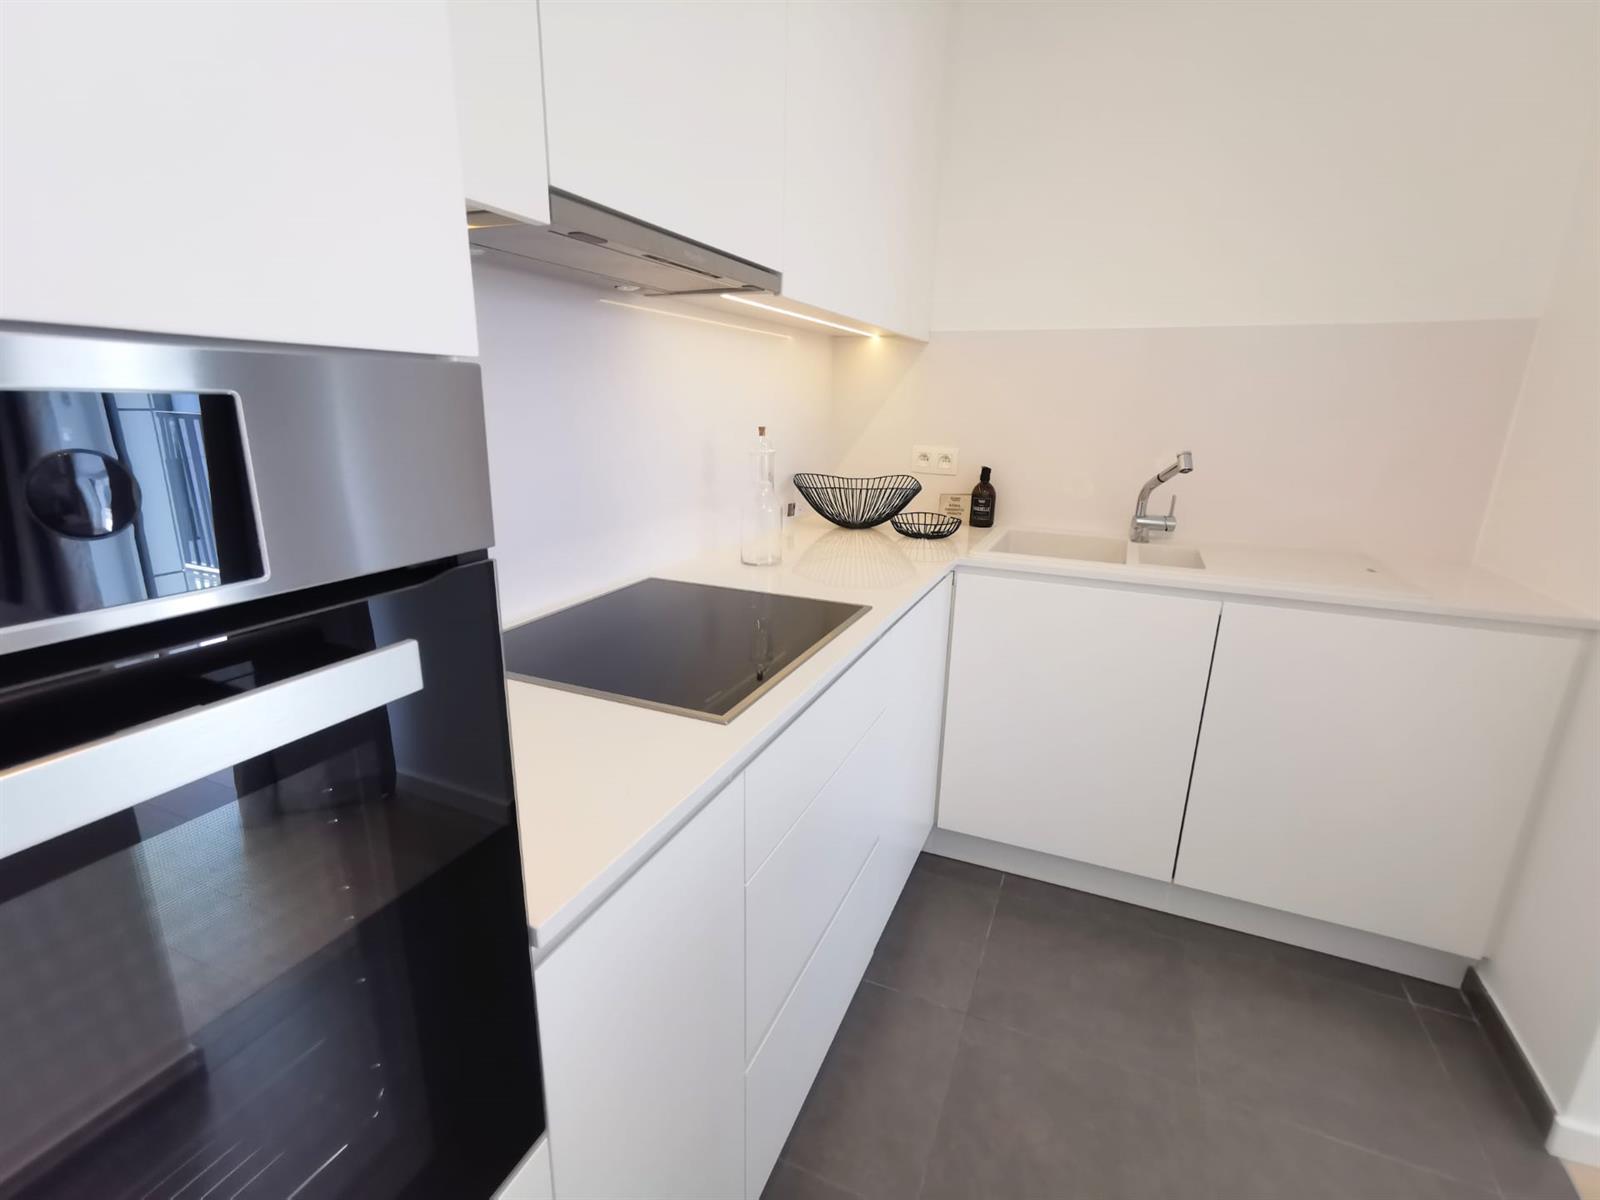 Appartement - Woluwe-Saint-Lambert - #4455516-3